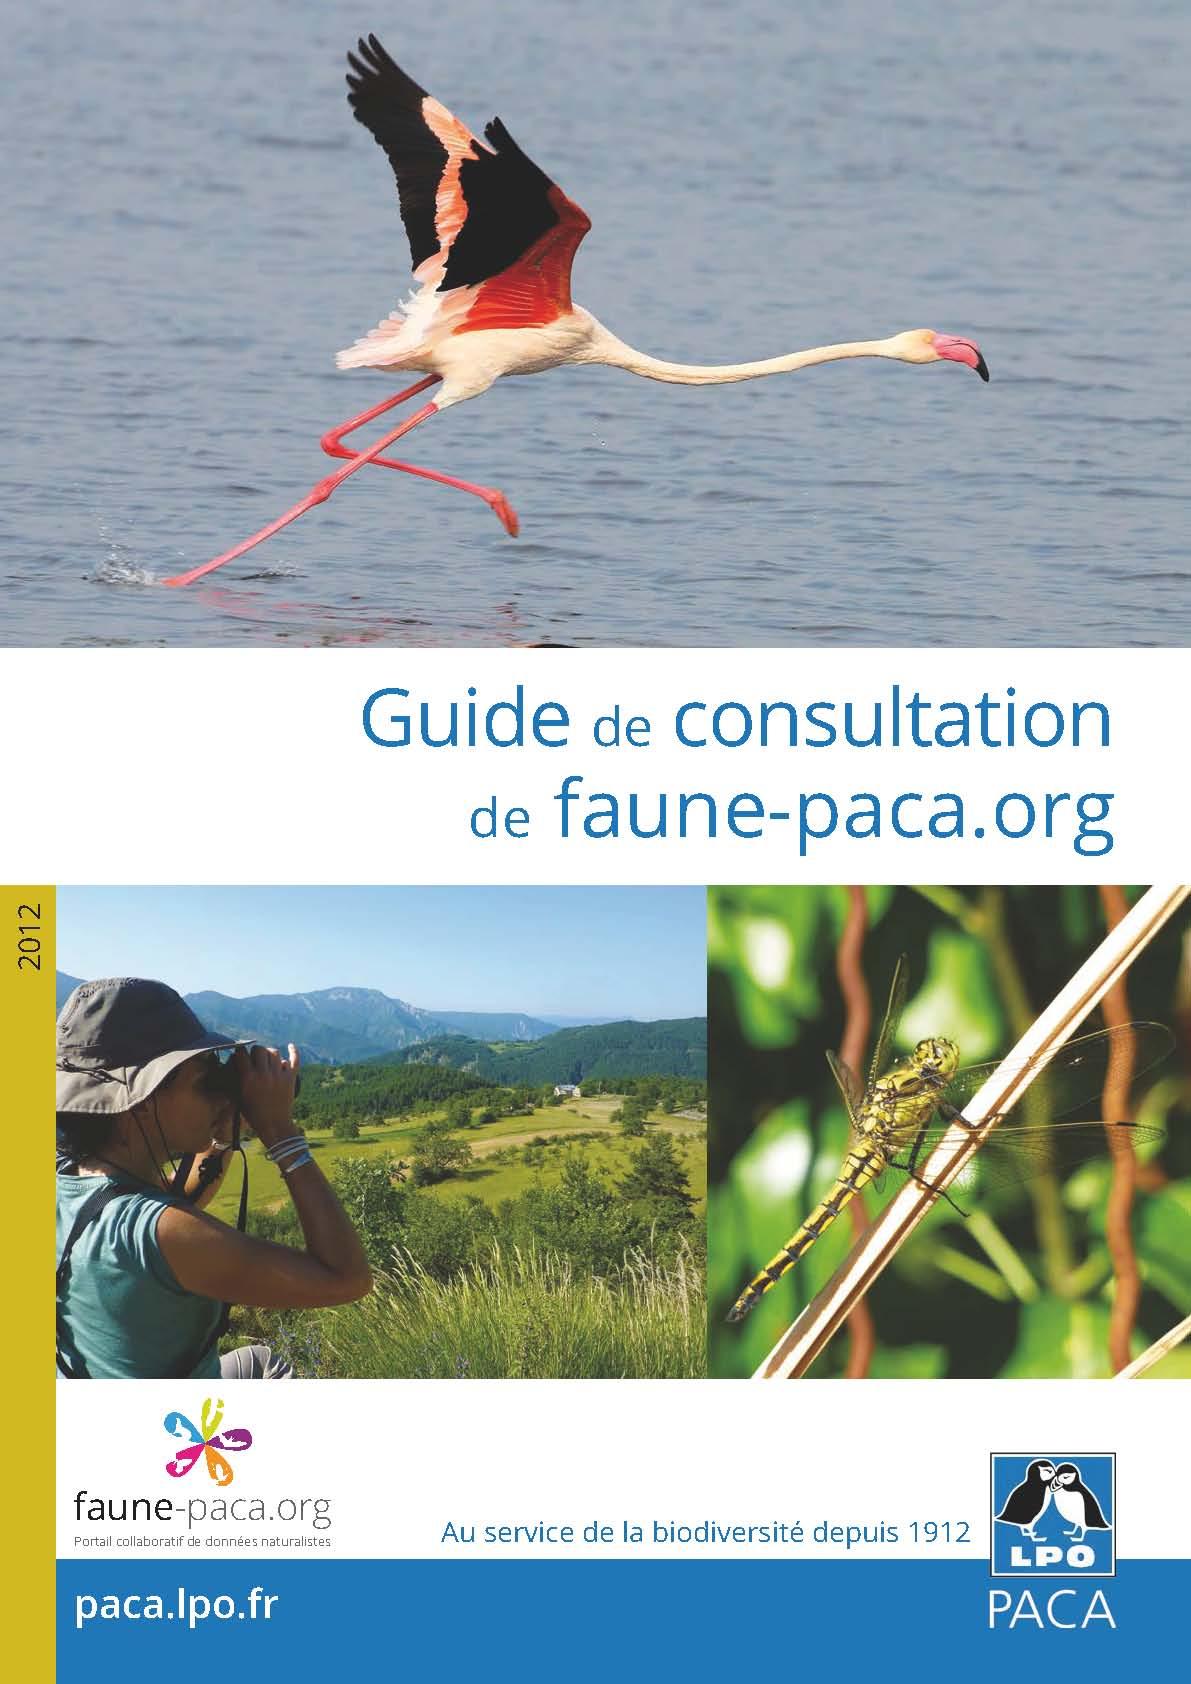 https://cdnfiles2.biolovision.net/www.faune-paca.org/userfiles/guideconsultationfaunepacaVFPage01.jpg